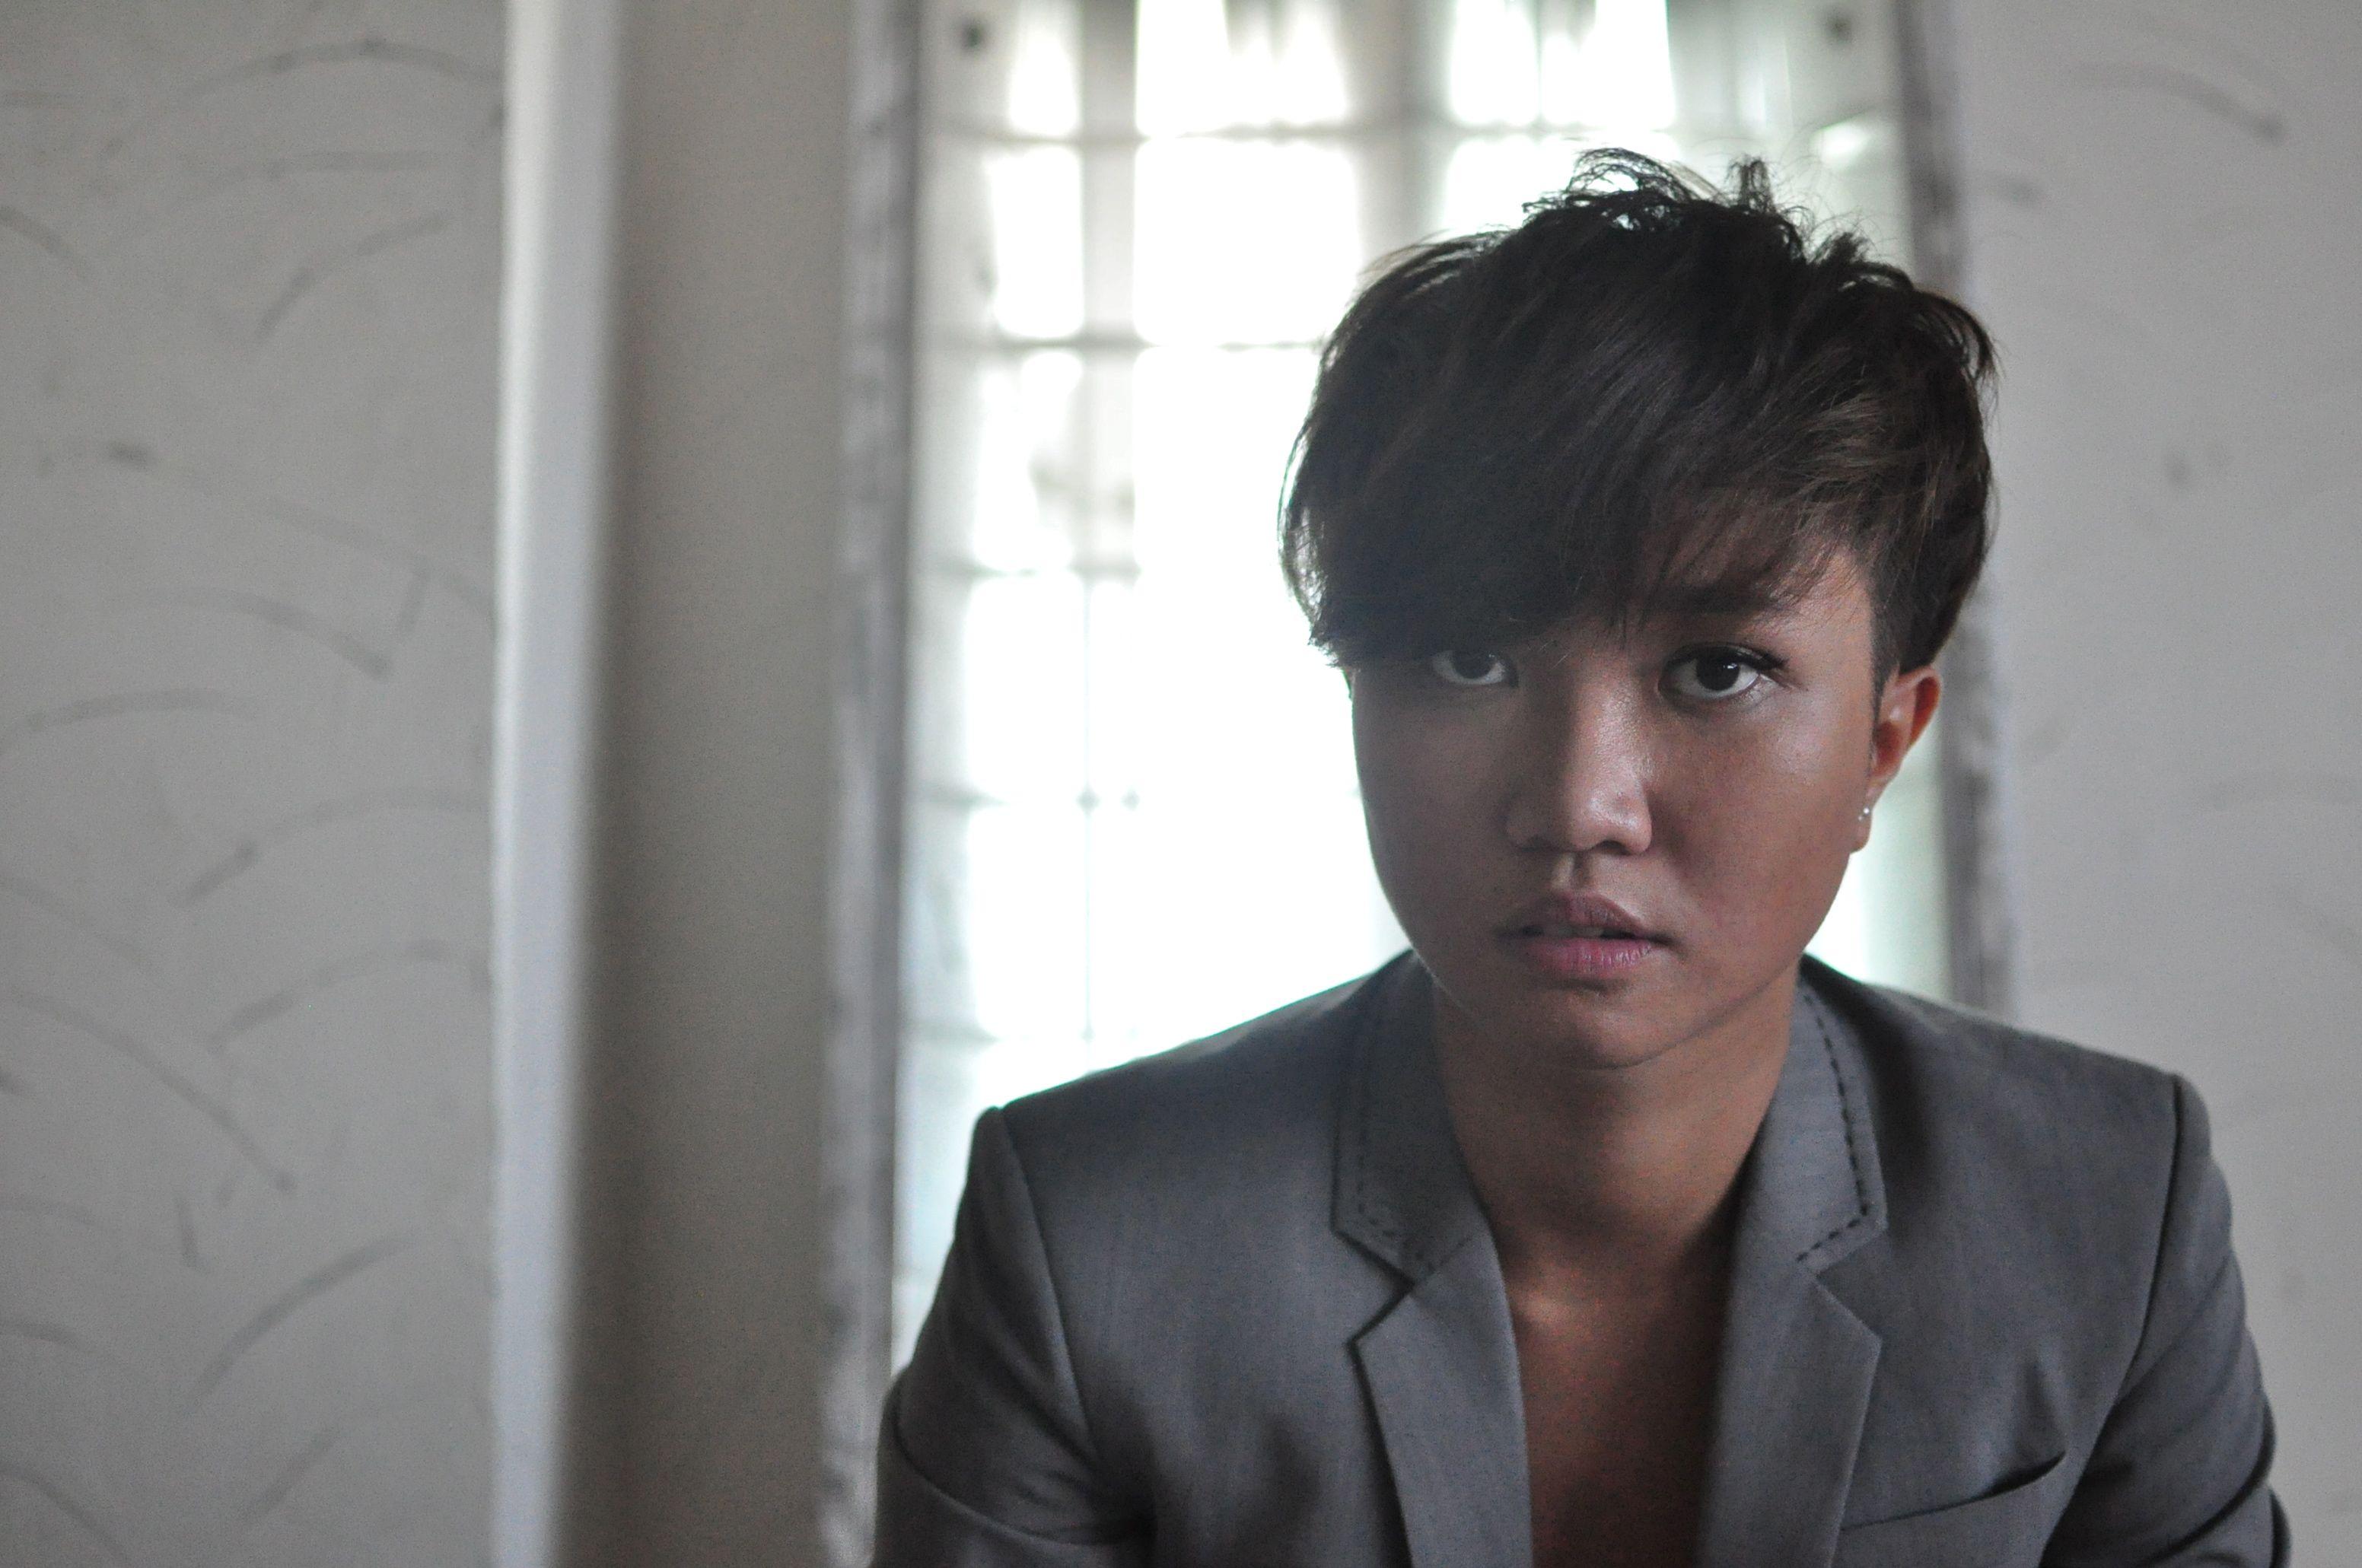 Director Samantha Lee